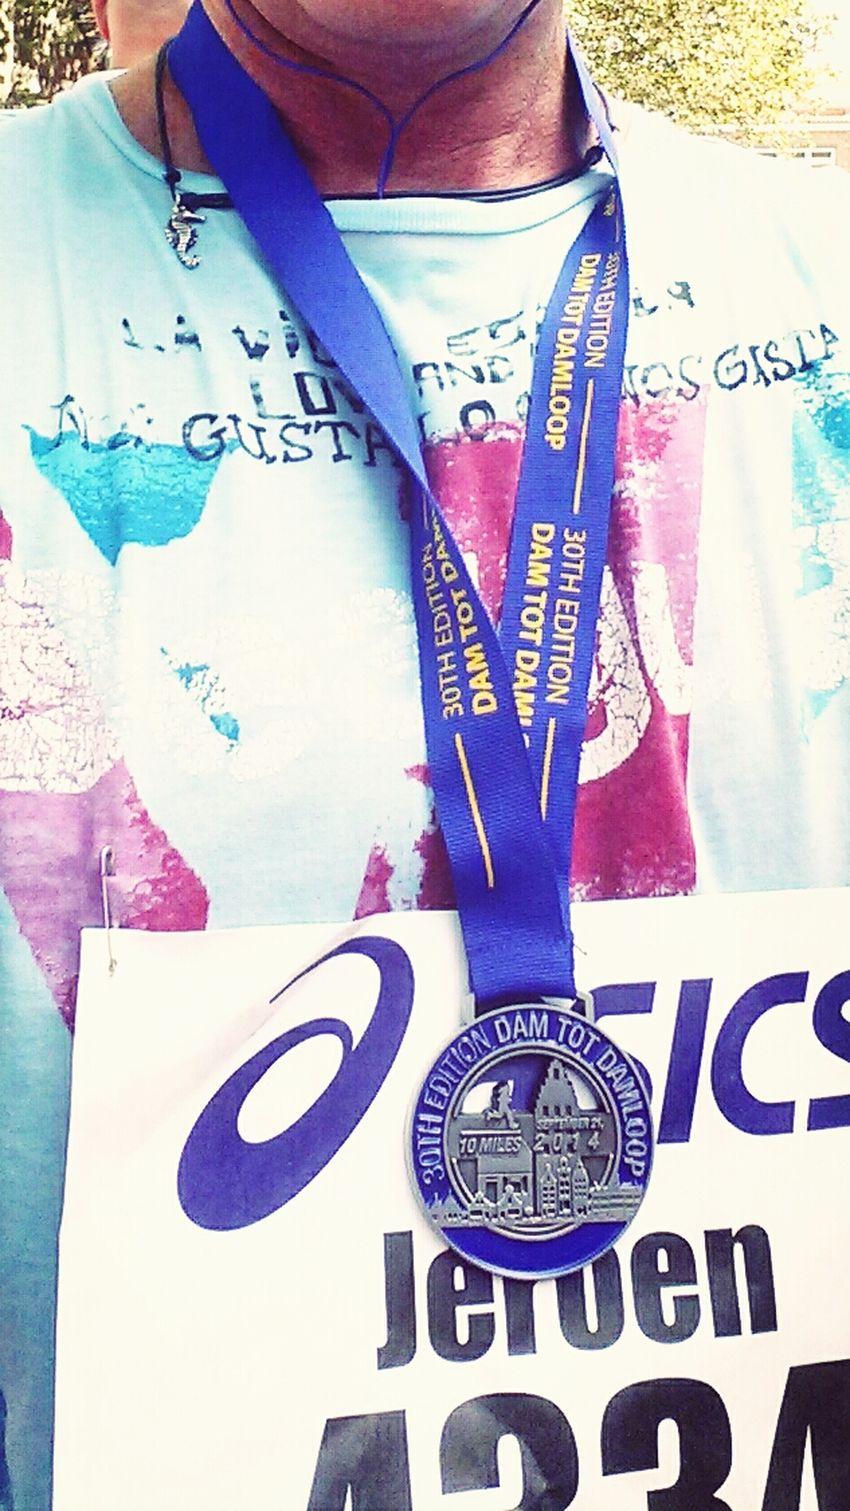 Another medal for the sock drawer! Jogging Excercising 16k